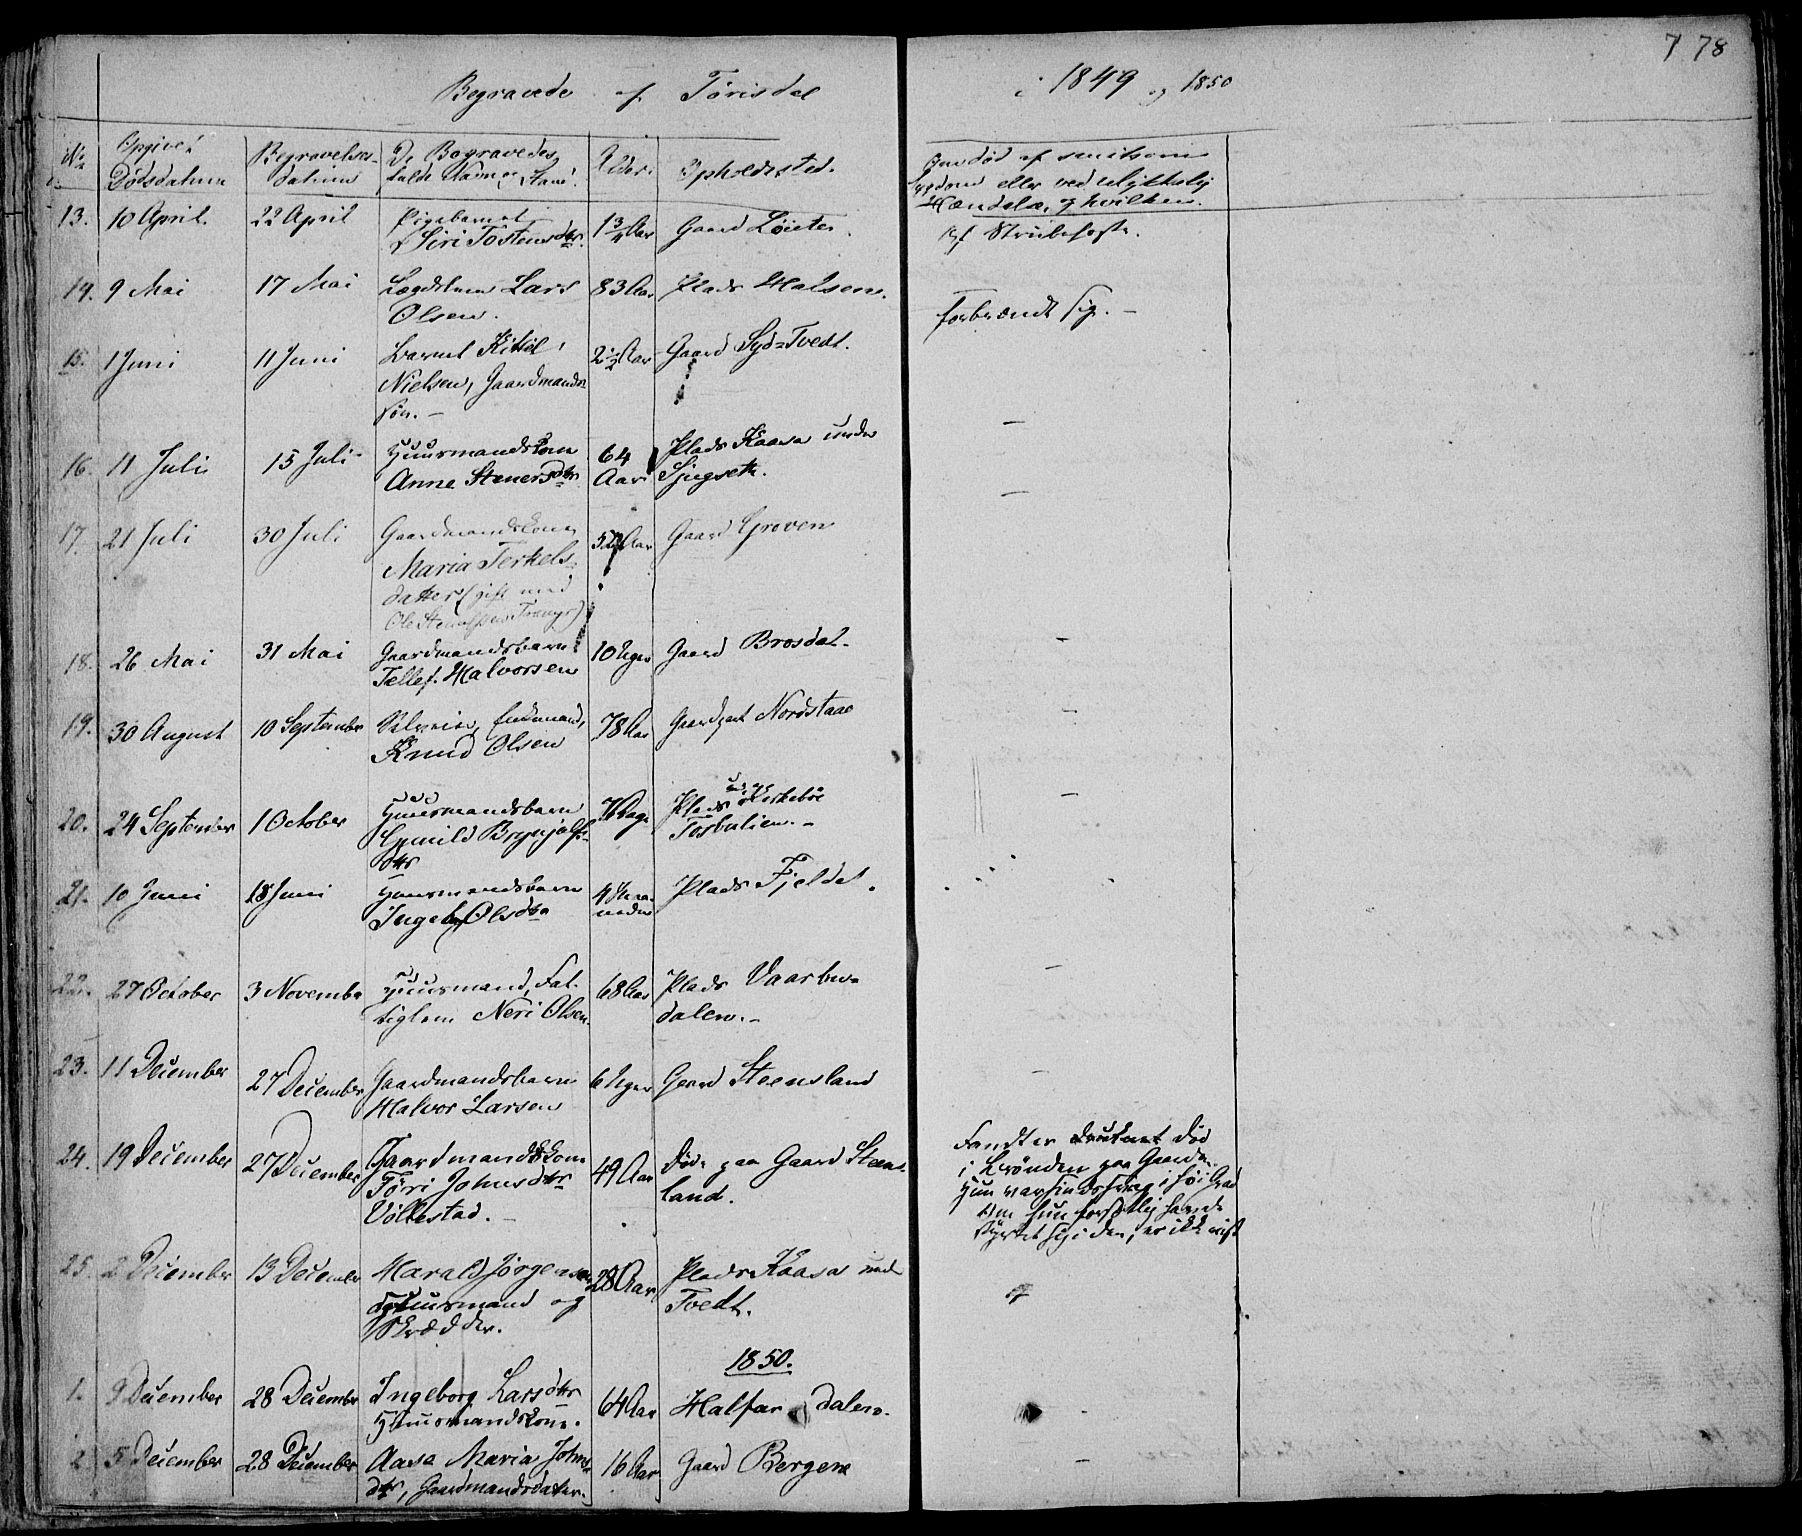 SAKO, Drangedal kirkebøker, F/Fa/L0007b: Ministerialbok nr. 7b, 1837-1856, s. 778